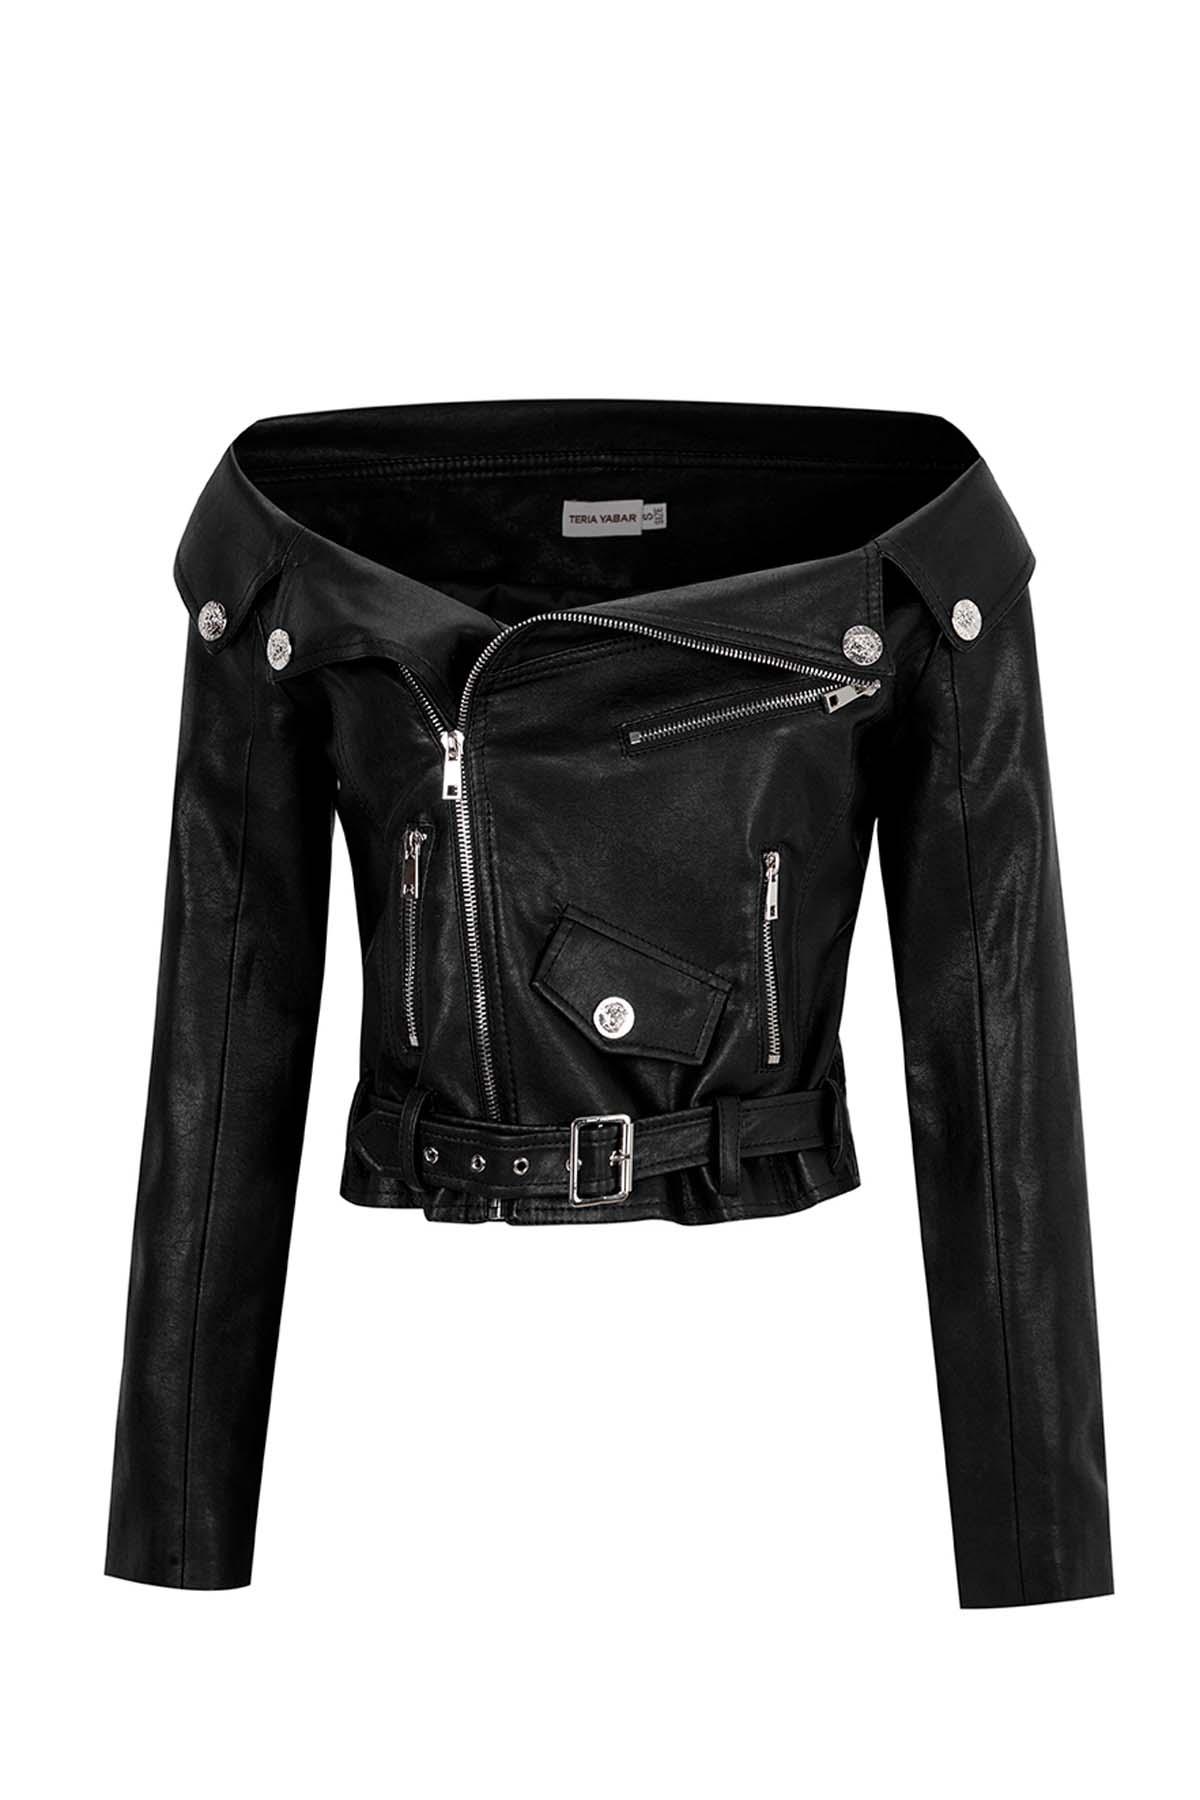 Teria Yabar - Biker negra